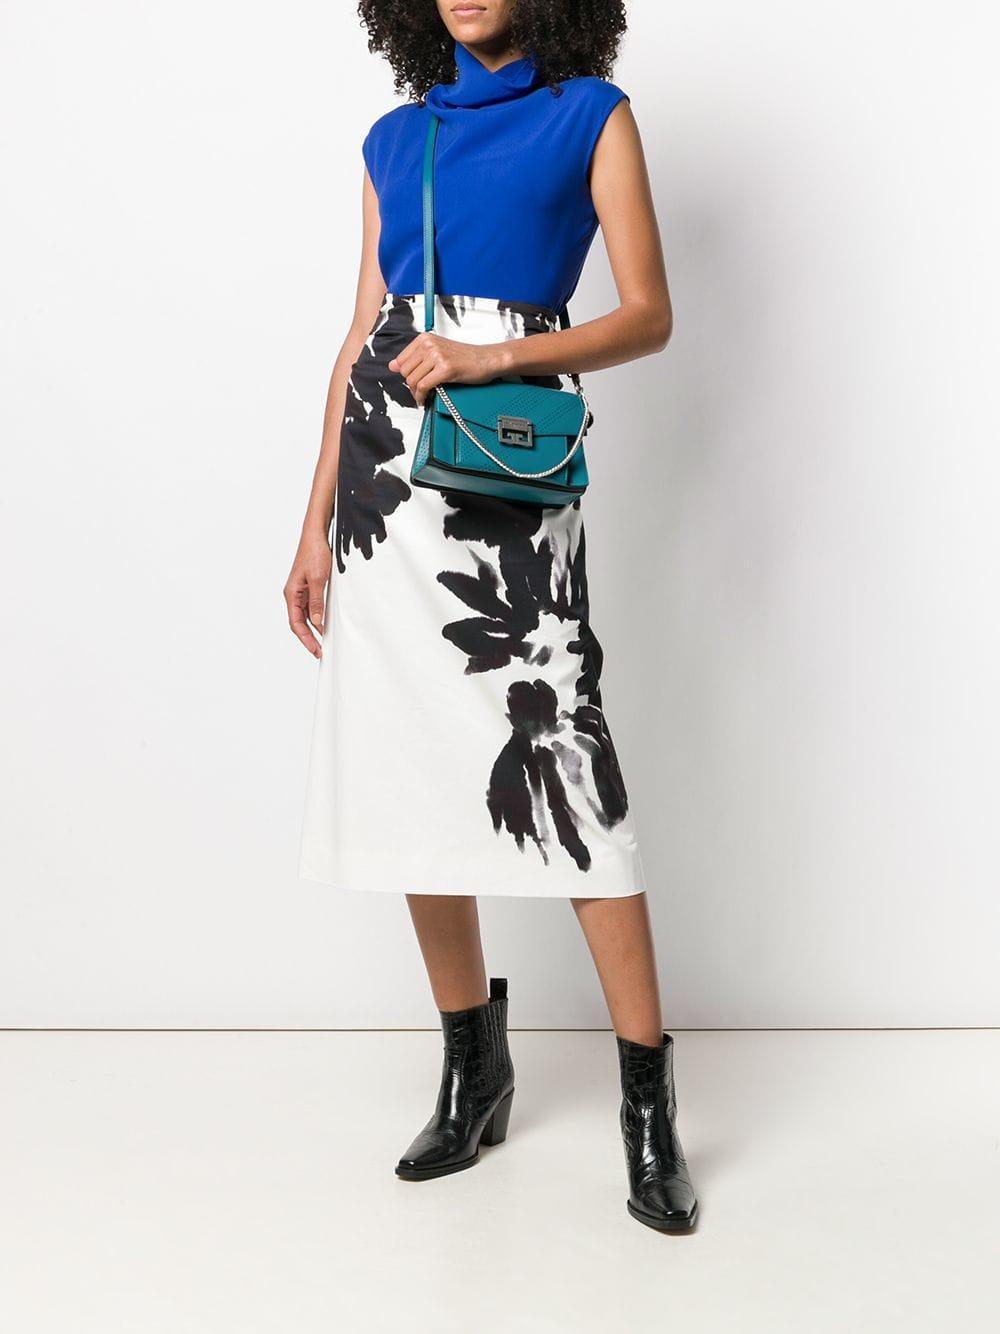 fcc4805431 Givenchy - Blue Gv3 Small Bag - Lyst. View fullscreen